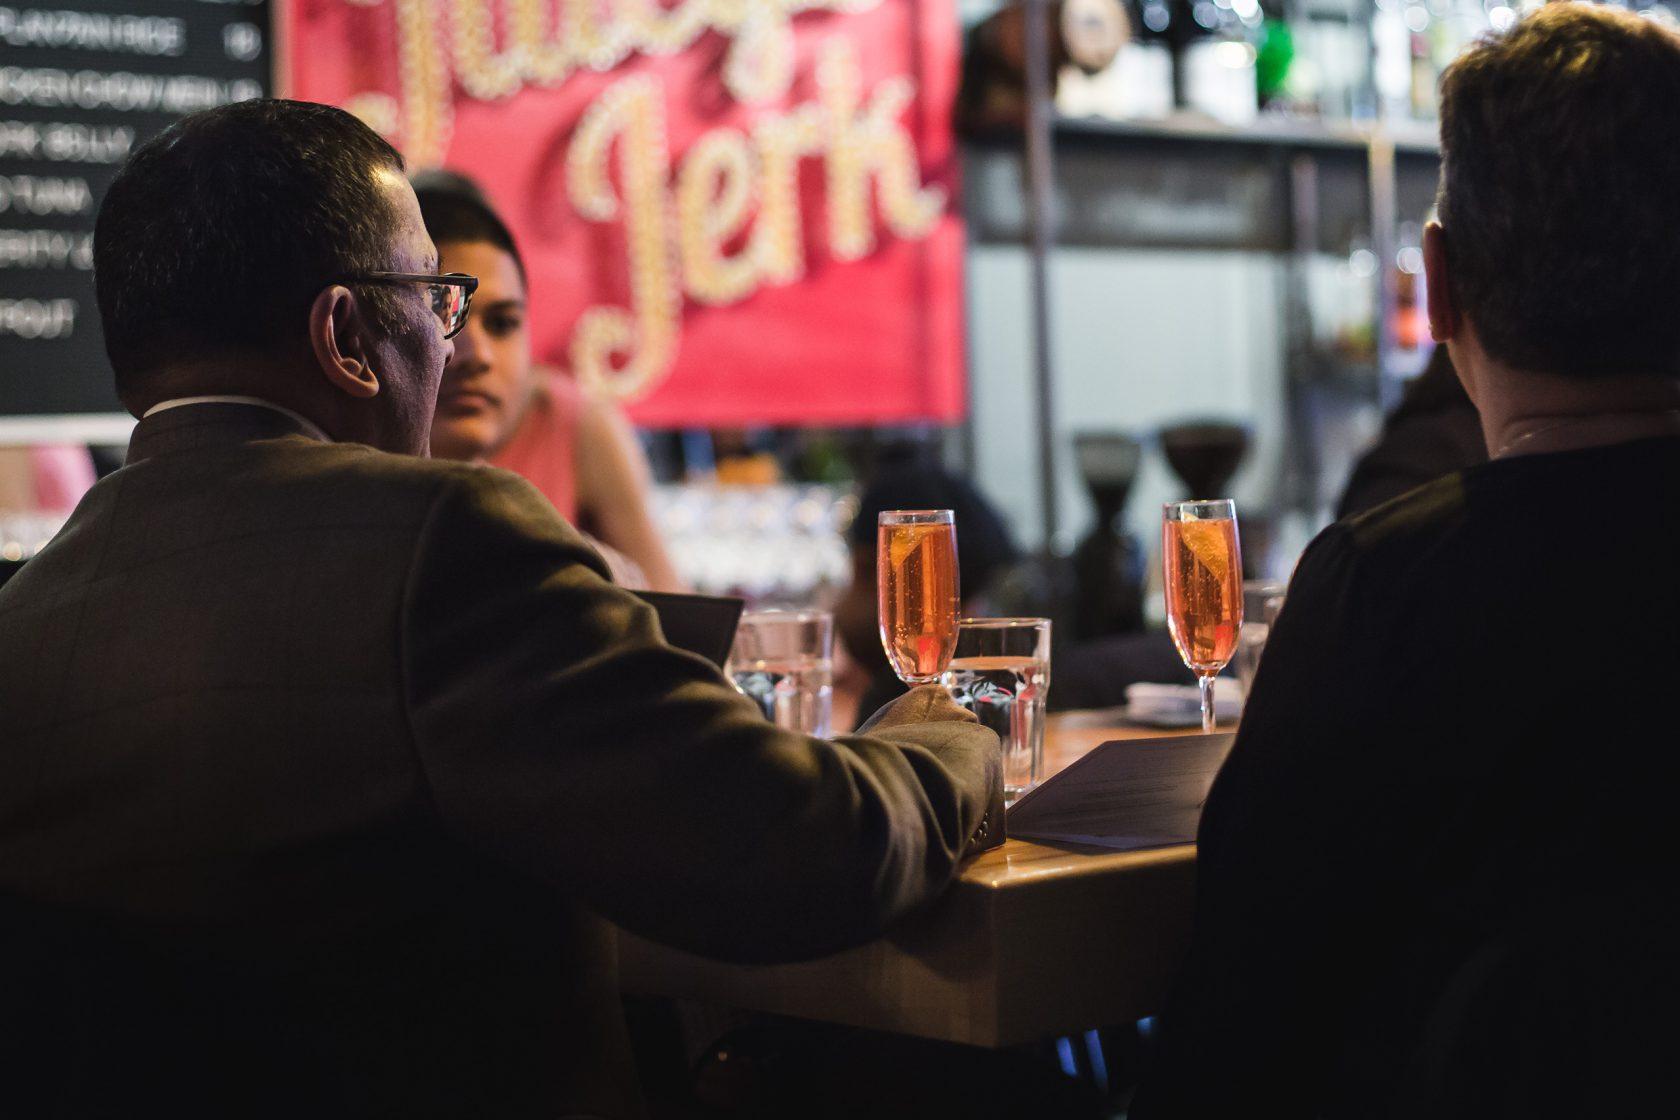 Friends casually having beer at a bar